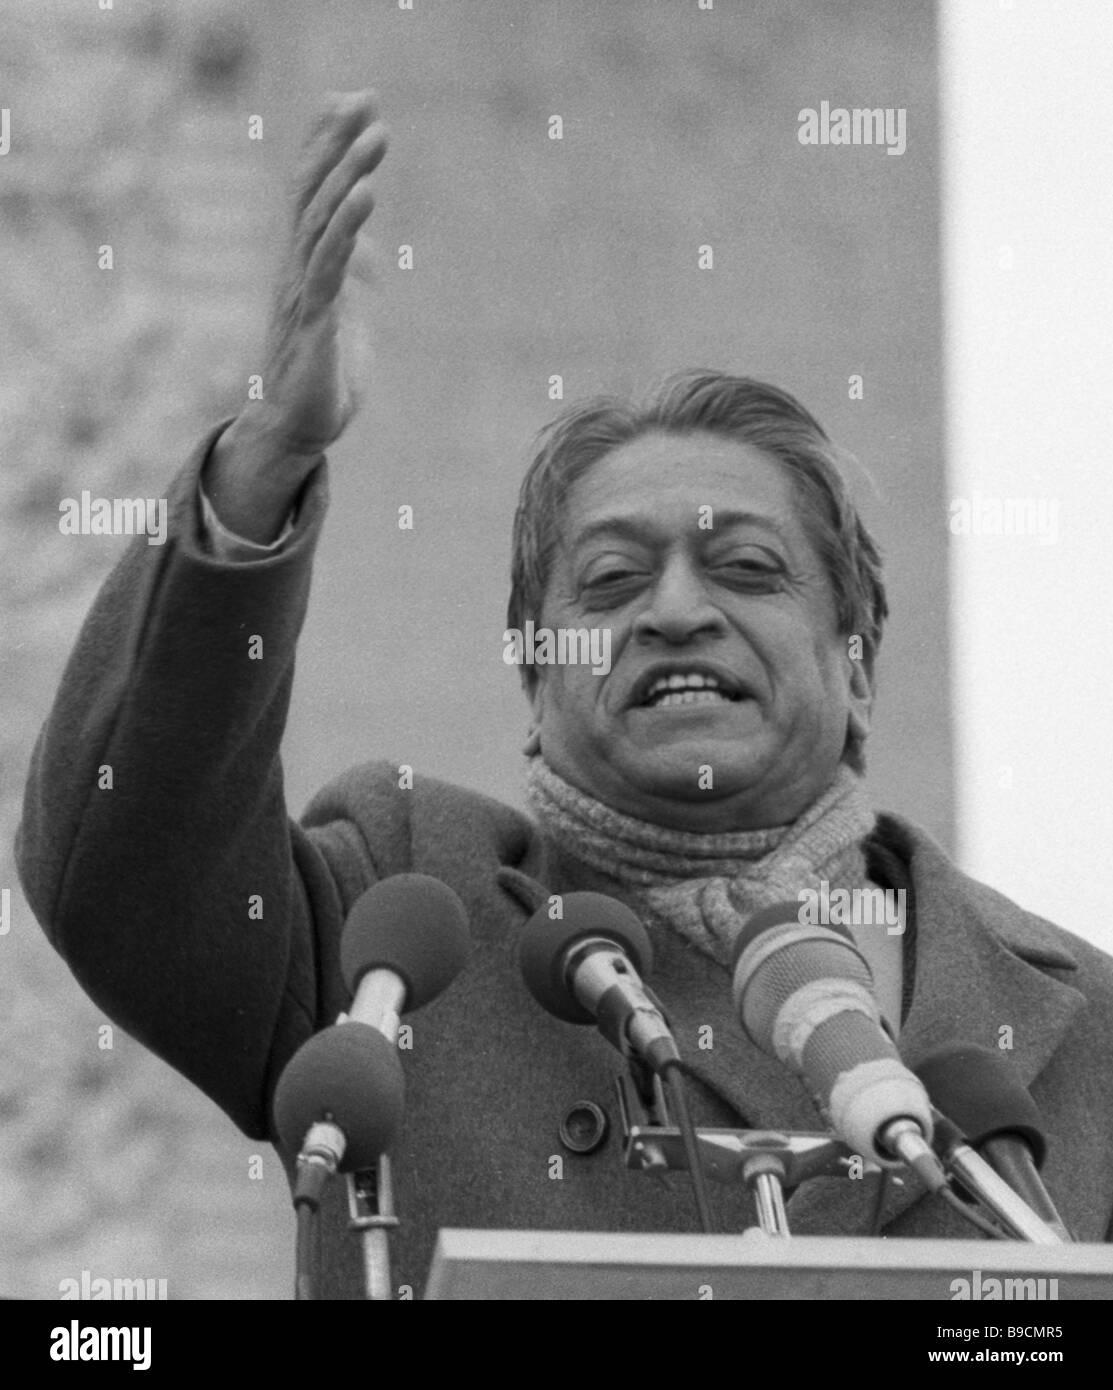 President of the World Peace Council Romesh Chandra addressing an 800 000 antiwar manifestation - Stock Image